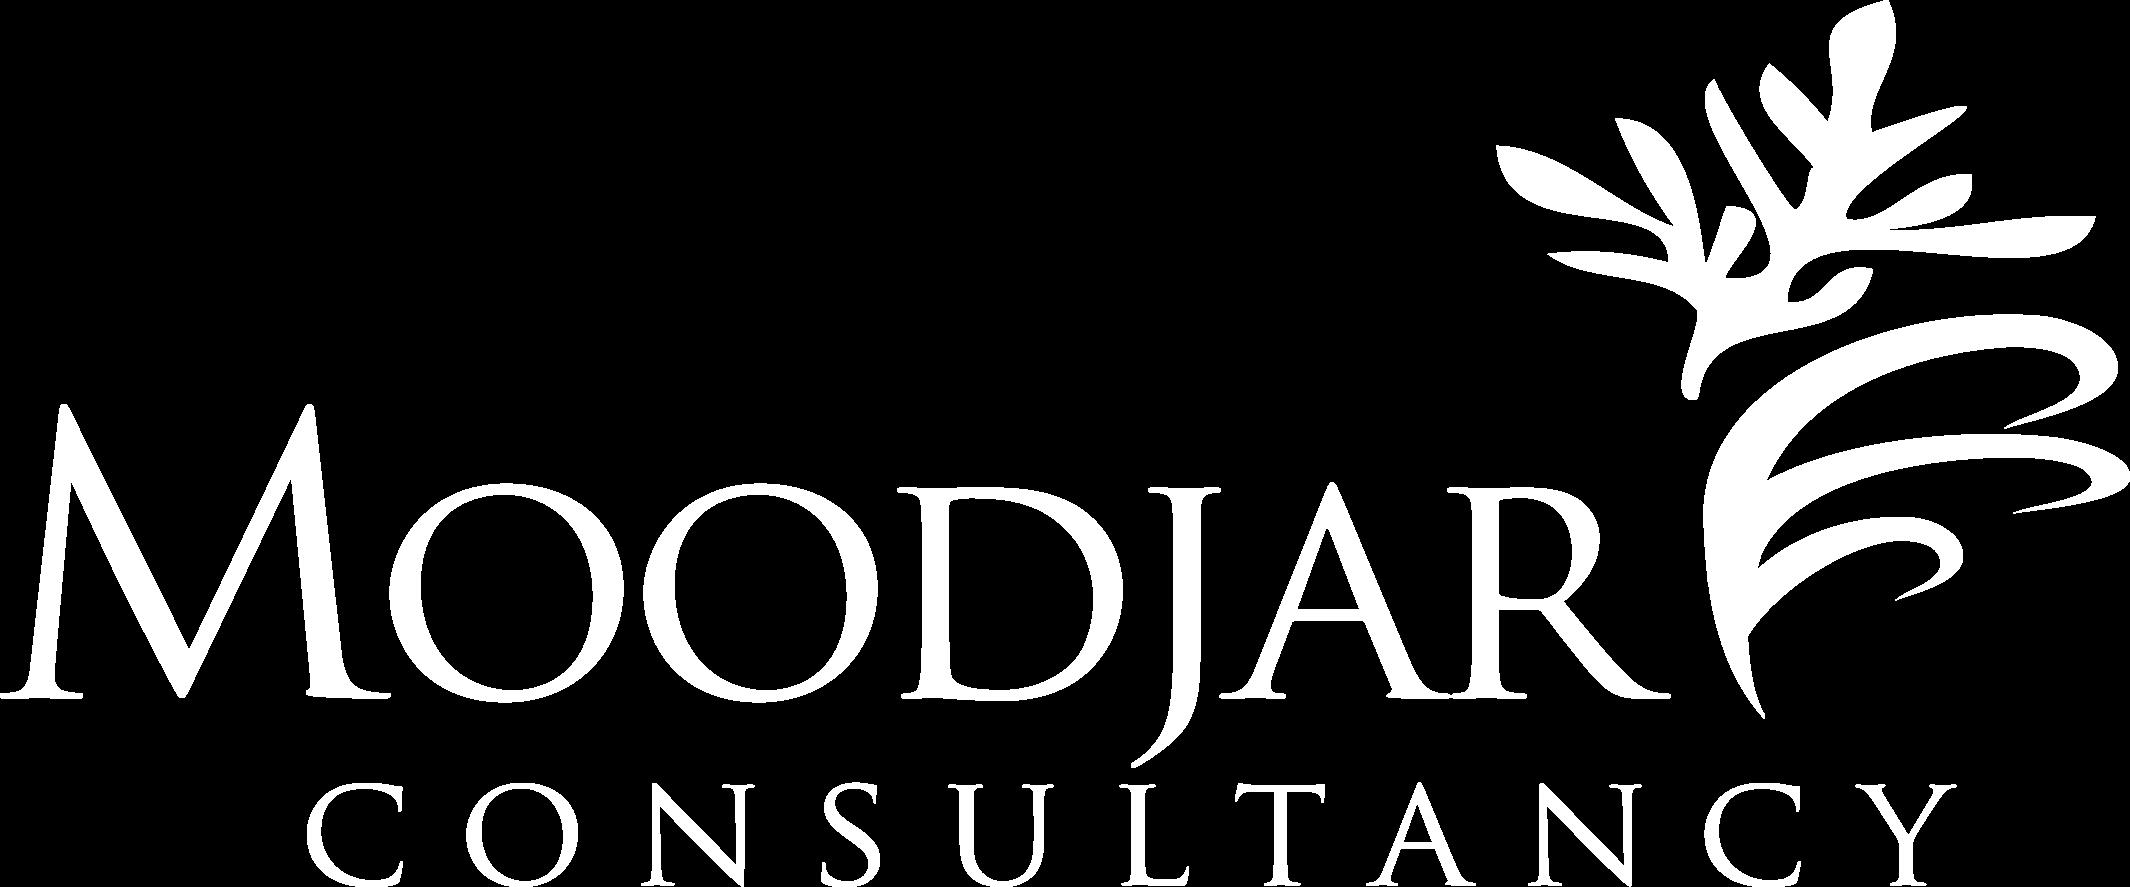 Moodjar Consultancy